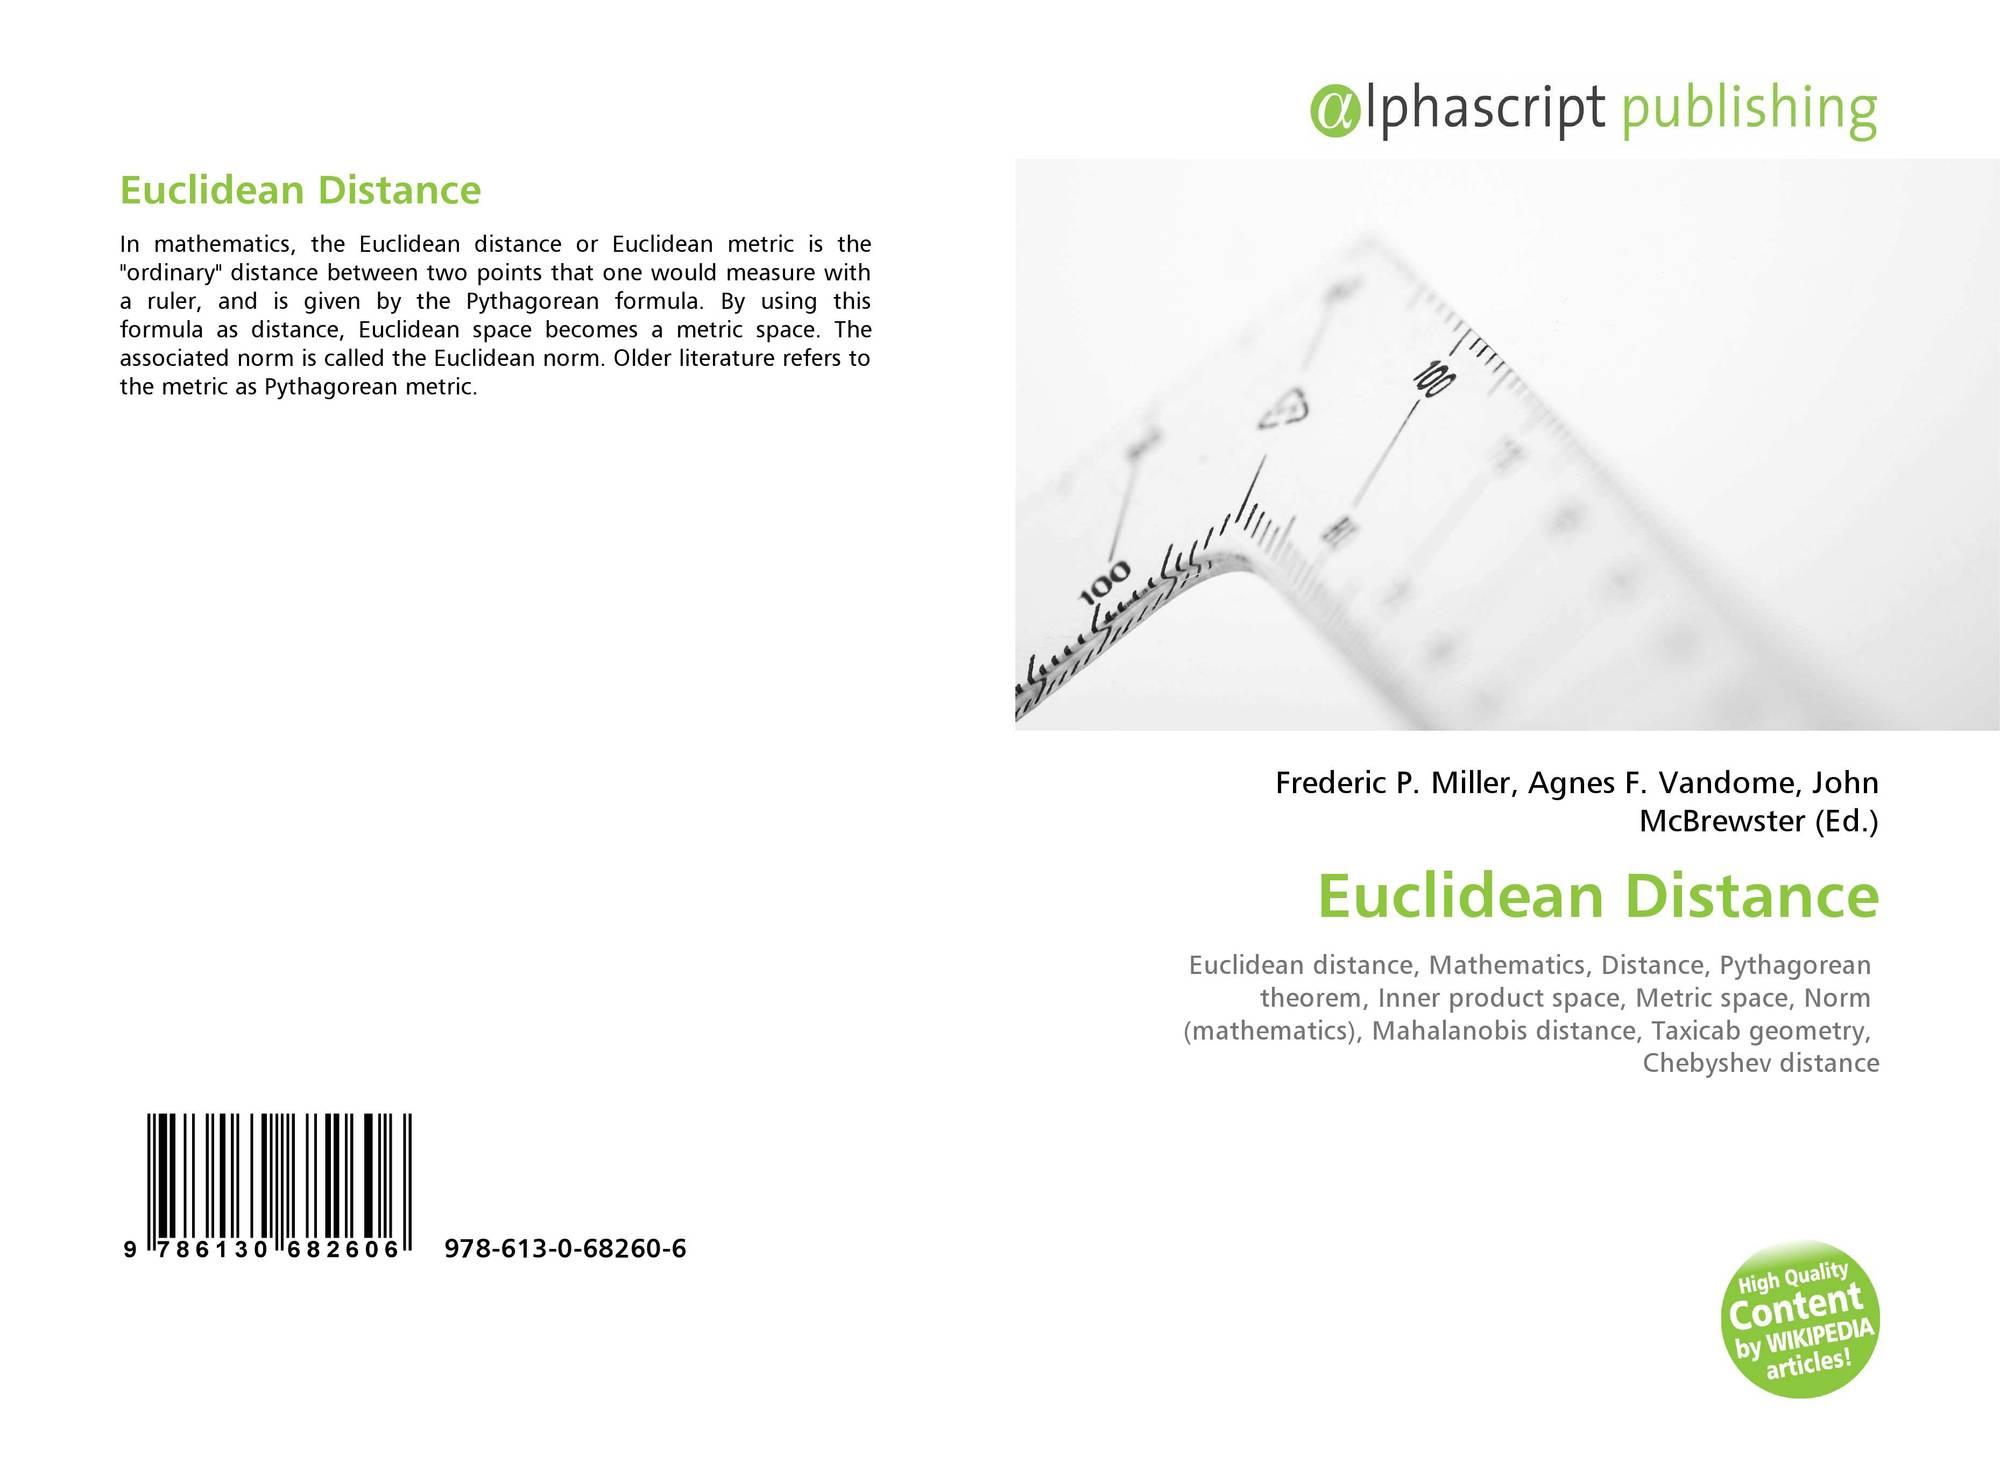 Euclidean Distance, 978-613-0-68260-6, 6130682603 ,9786130682606